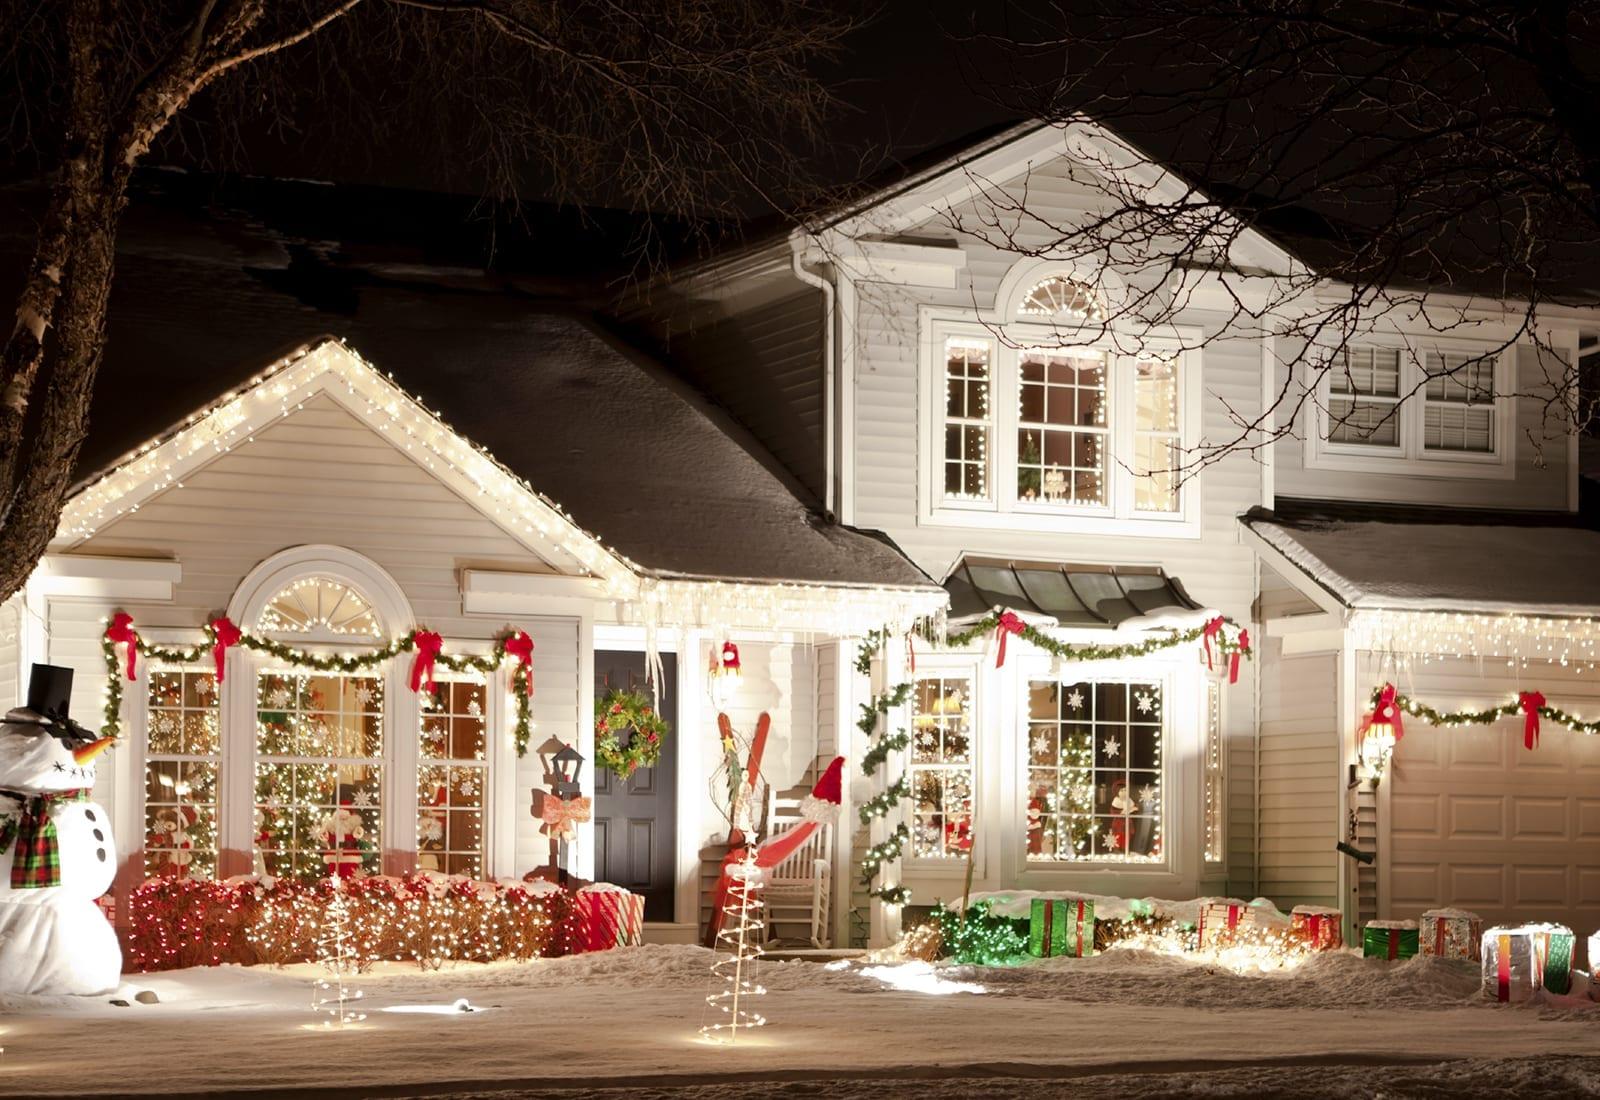 Christmas Lights & Outdoor Decor